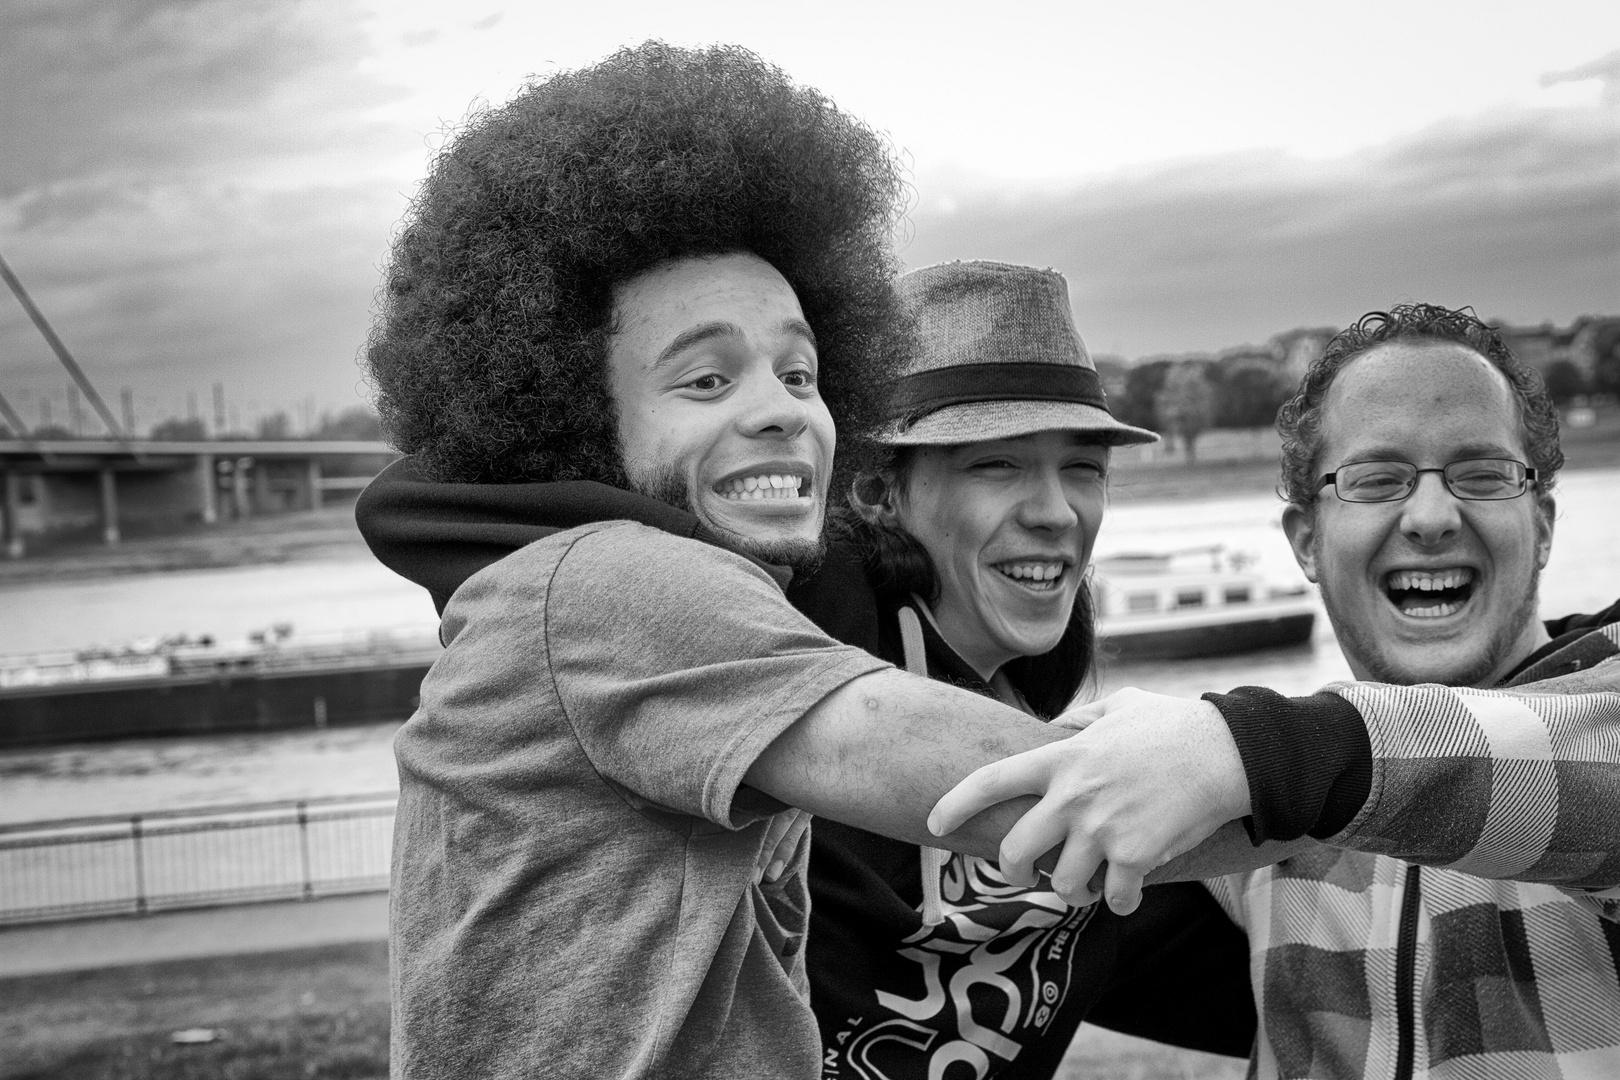 Funny People - worldwide photowalk Düsseldorf